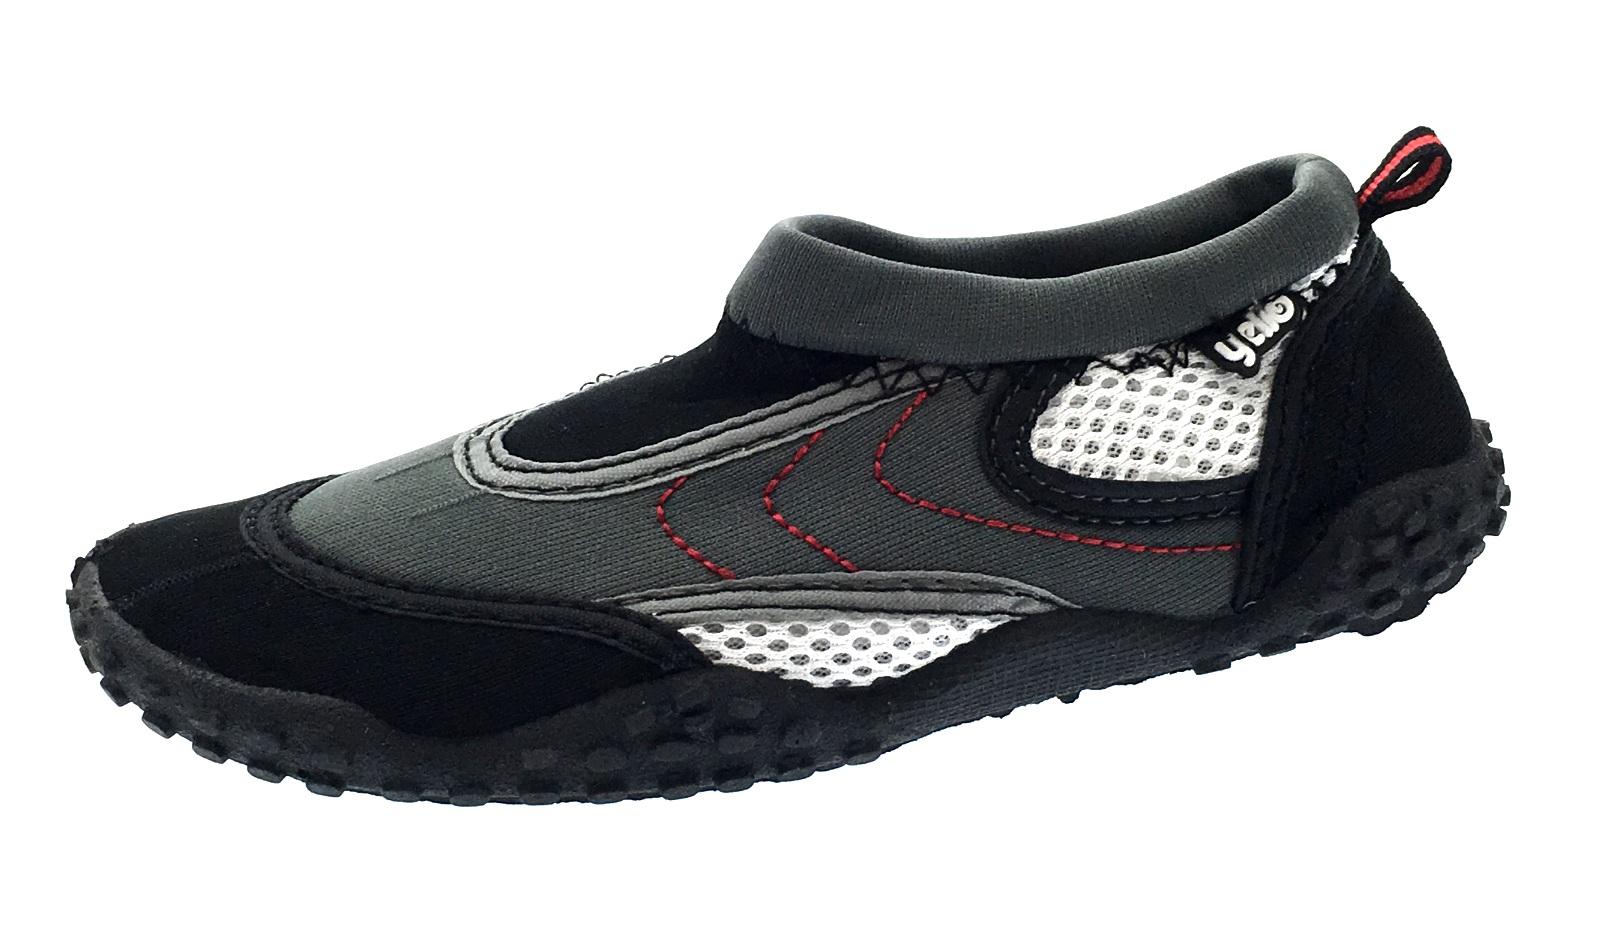 008fc73c7779 Boys Kids Aqua Socks Beach Water Shoes Wetsuit Swim Surf Protection ...